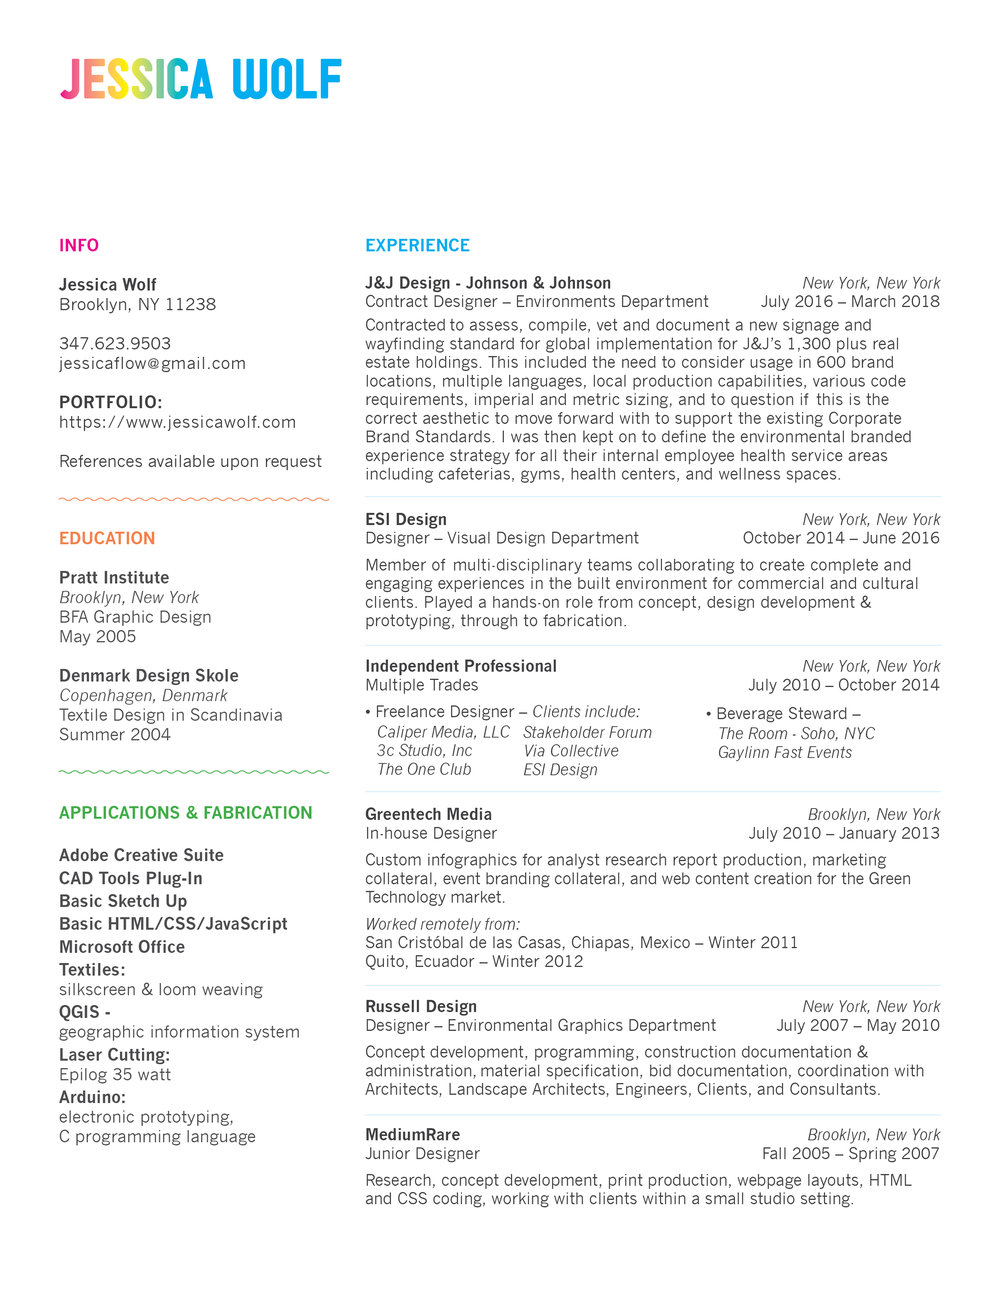 180628_JessicaWolf-Resume.jpg